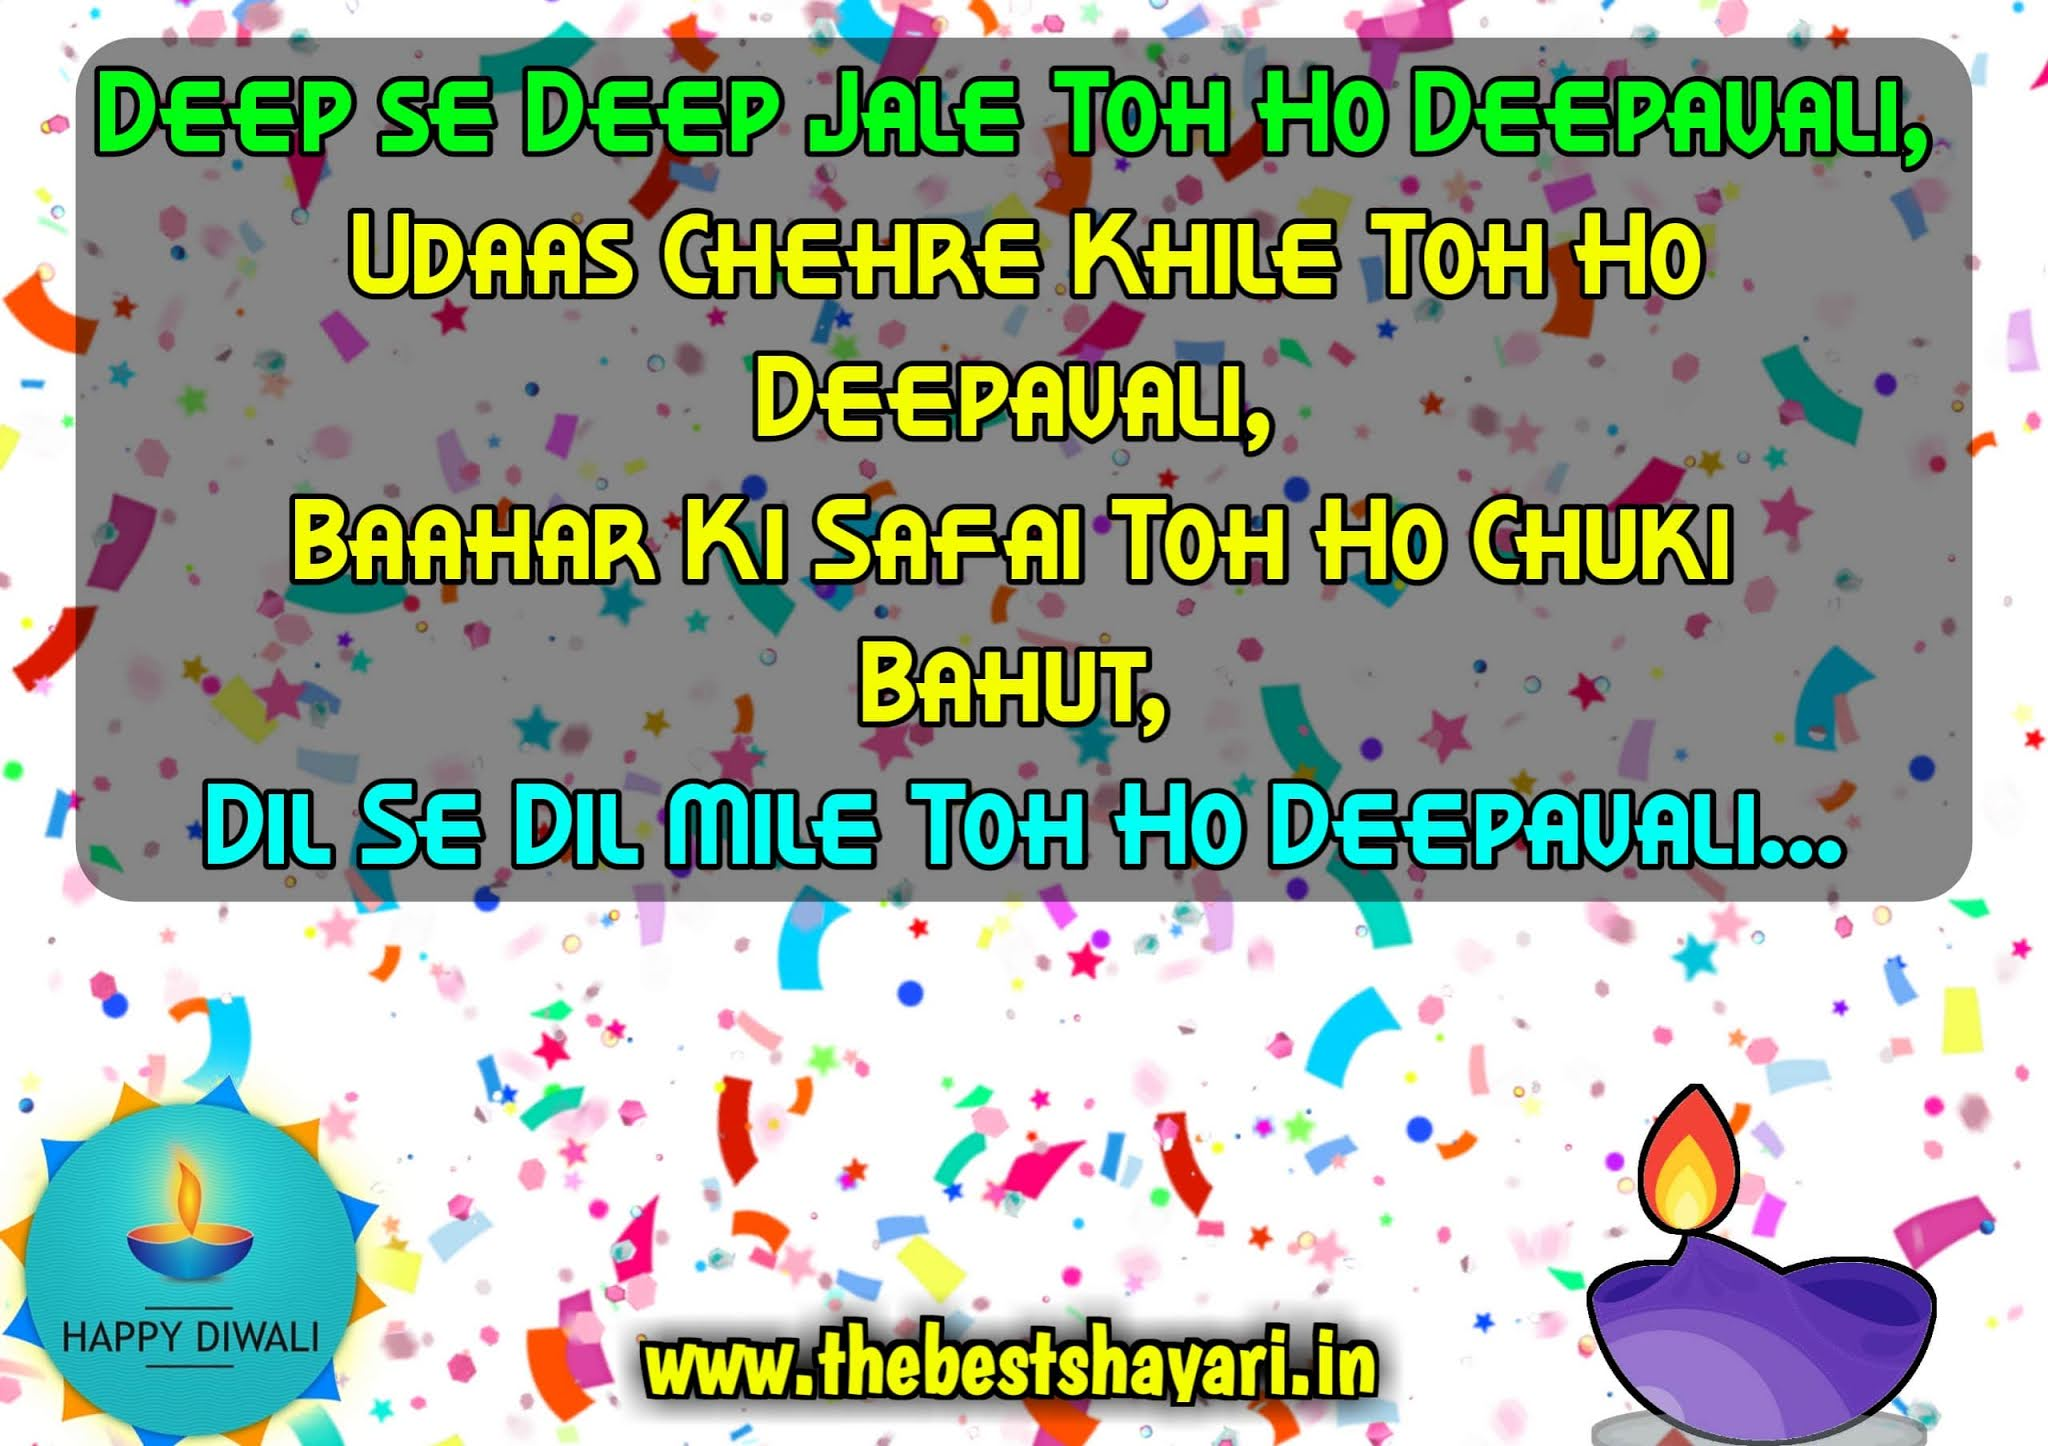 deepavali wishes message